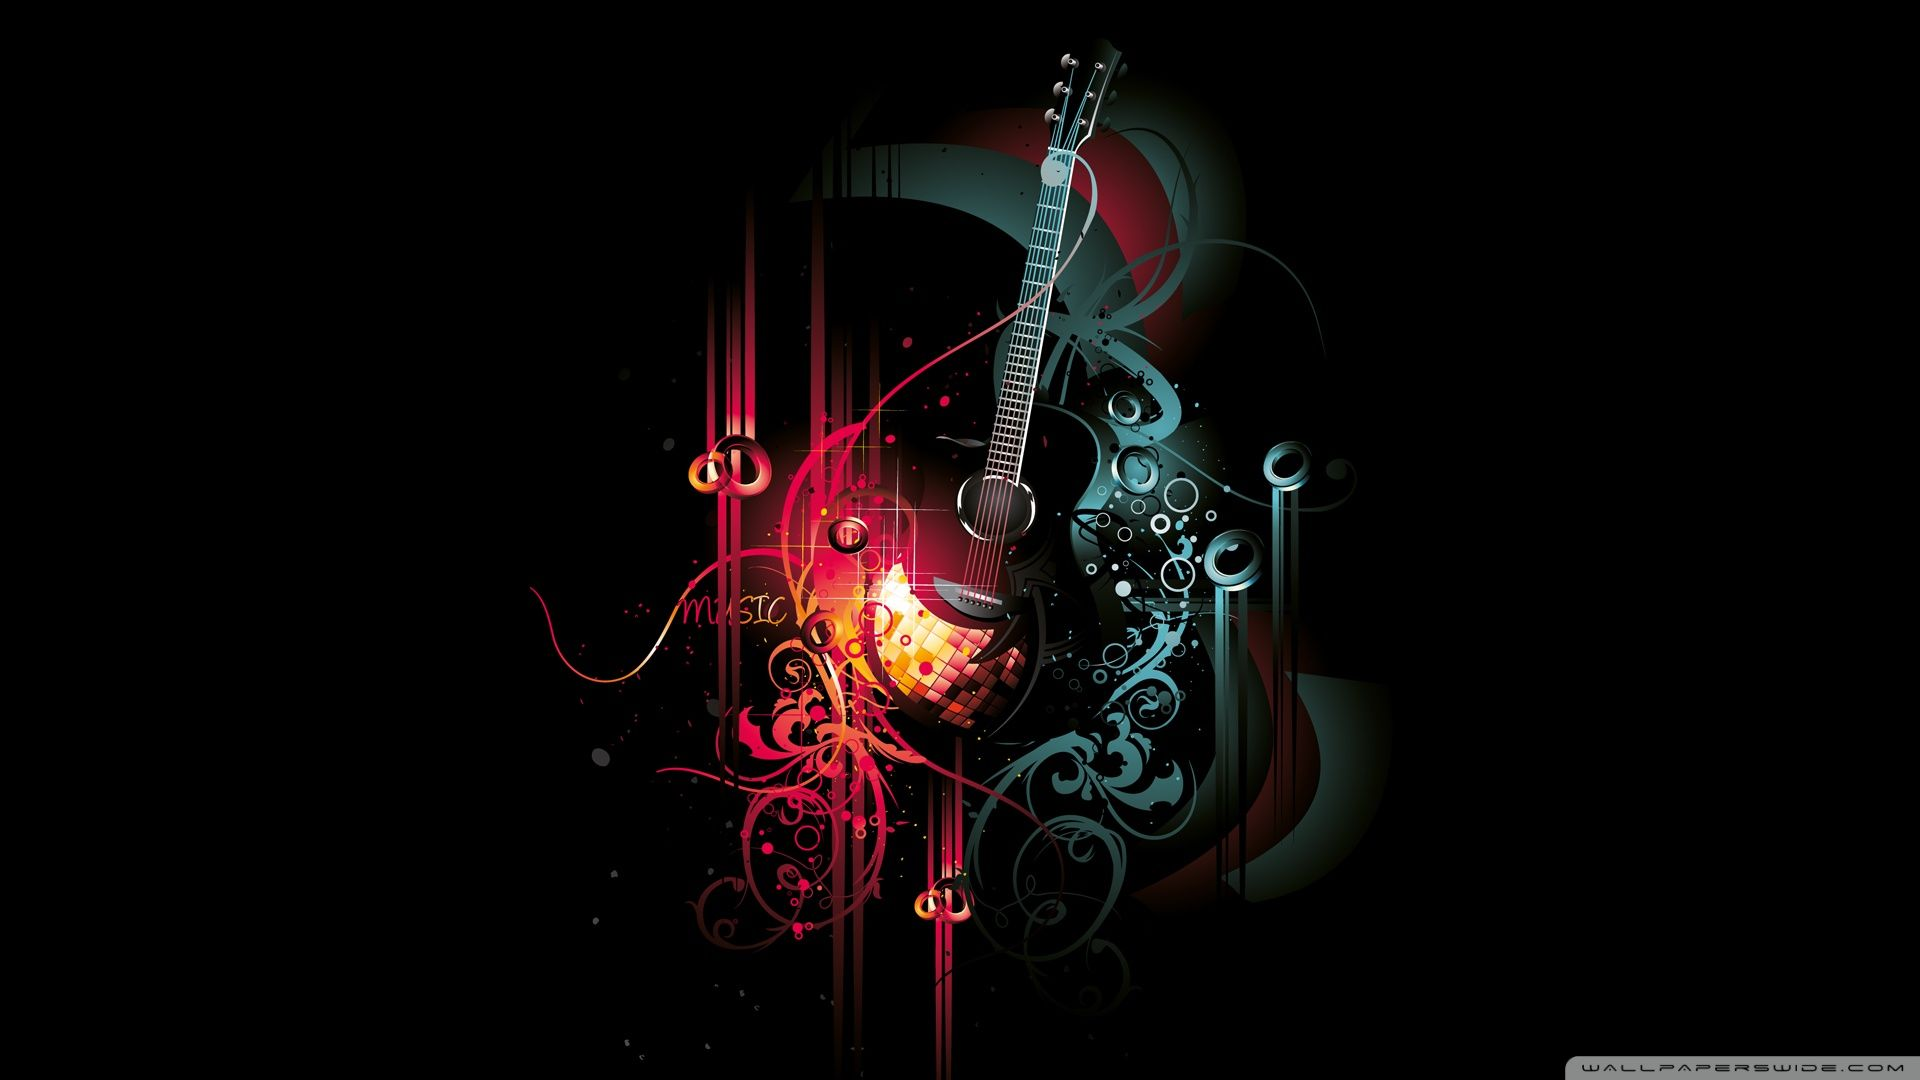 Hd Wallpapers Music Hd Wallpapers For Desktop Music Wallpaper